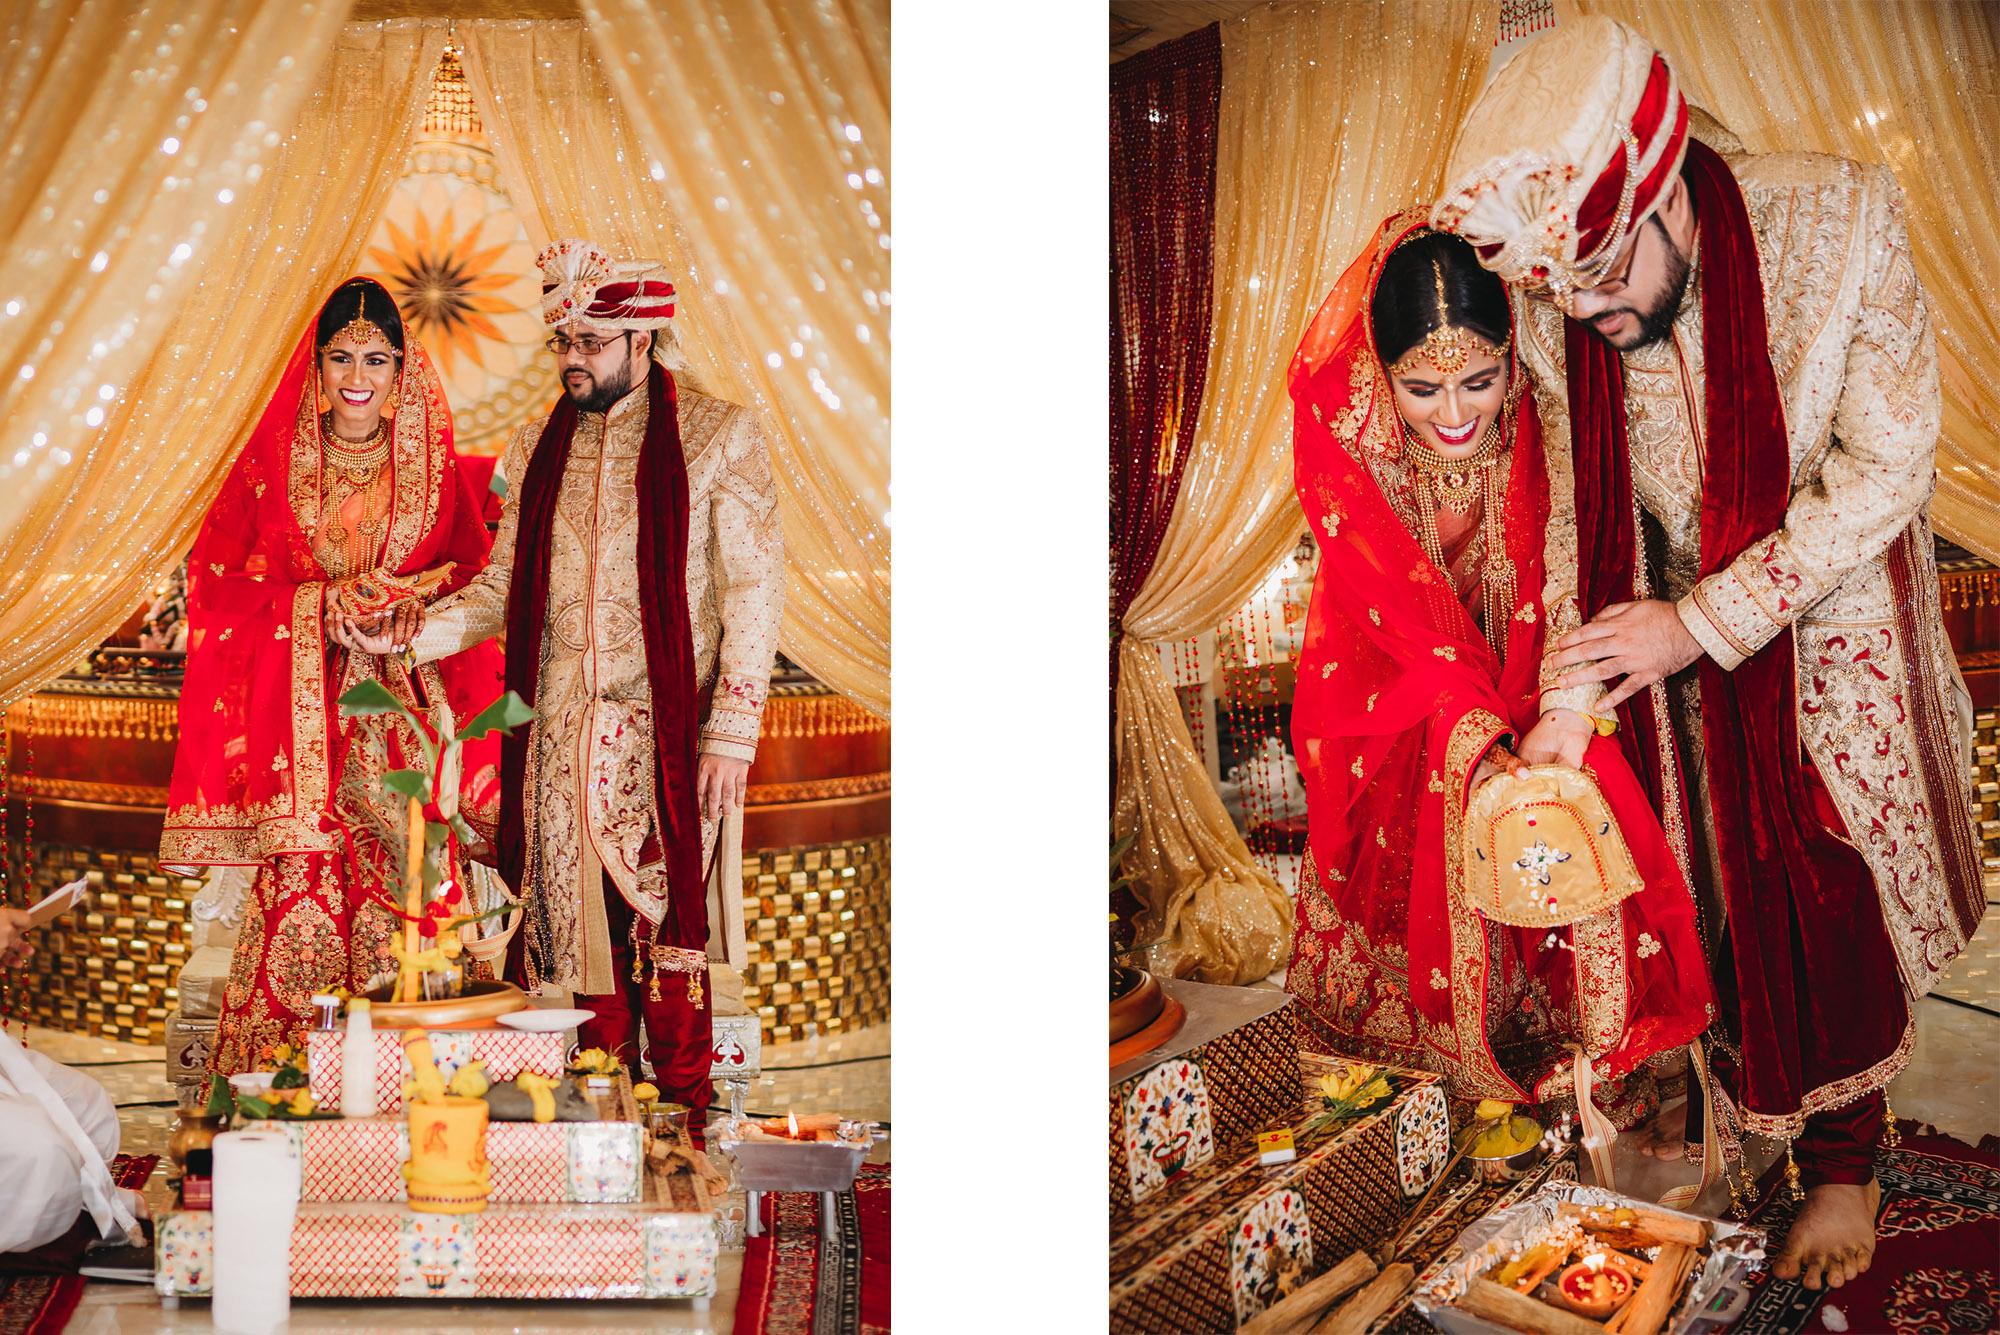 Hindu Wedding Ceremony at Lakshmi Narayan Temple